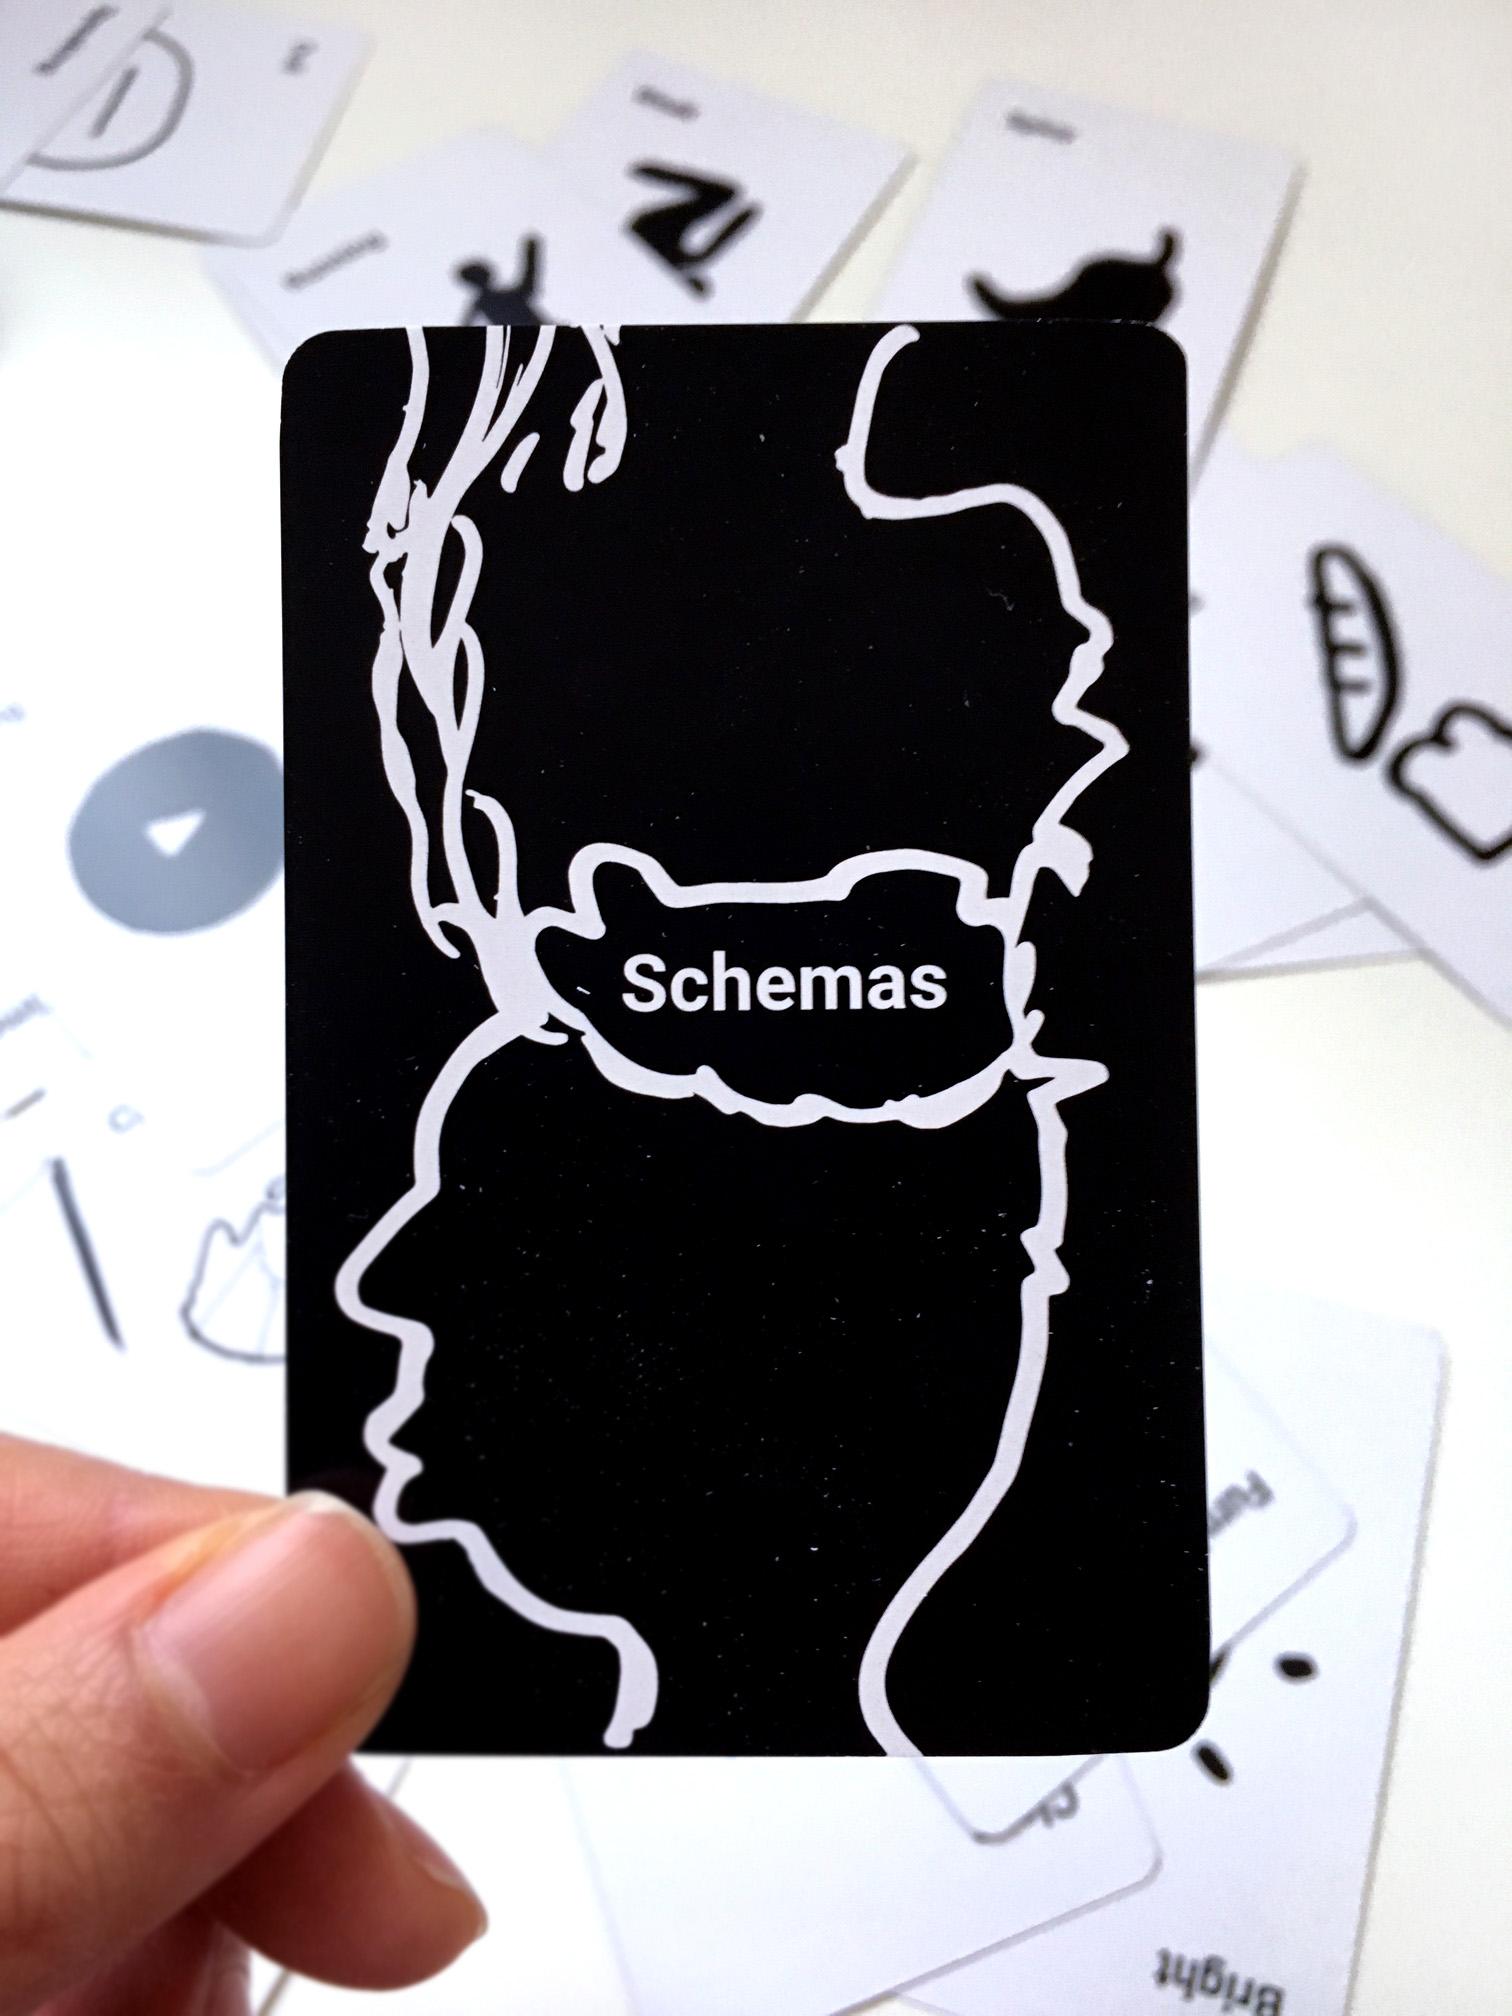 schemas2.jpg